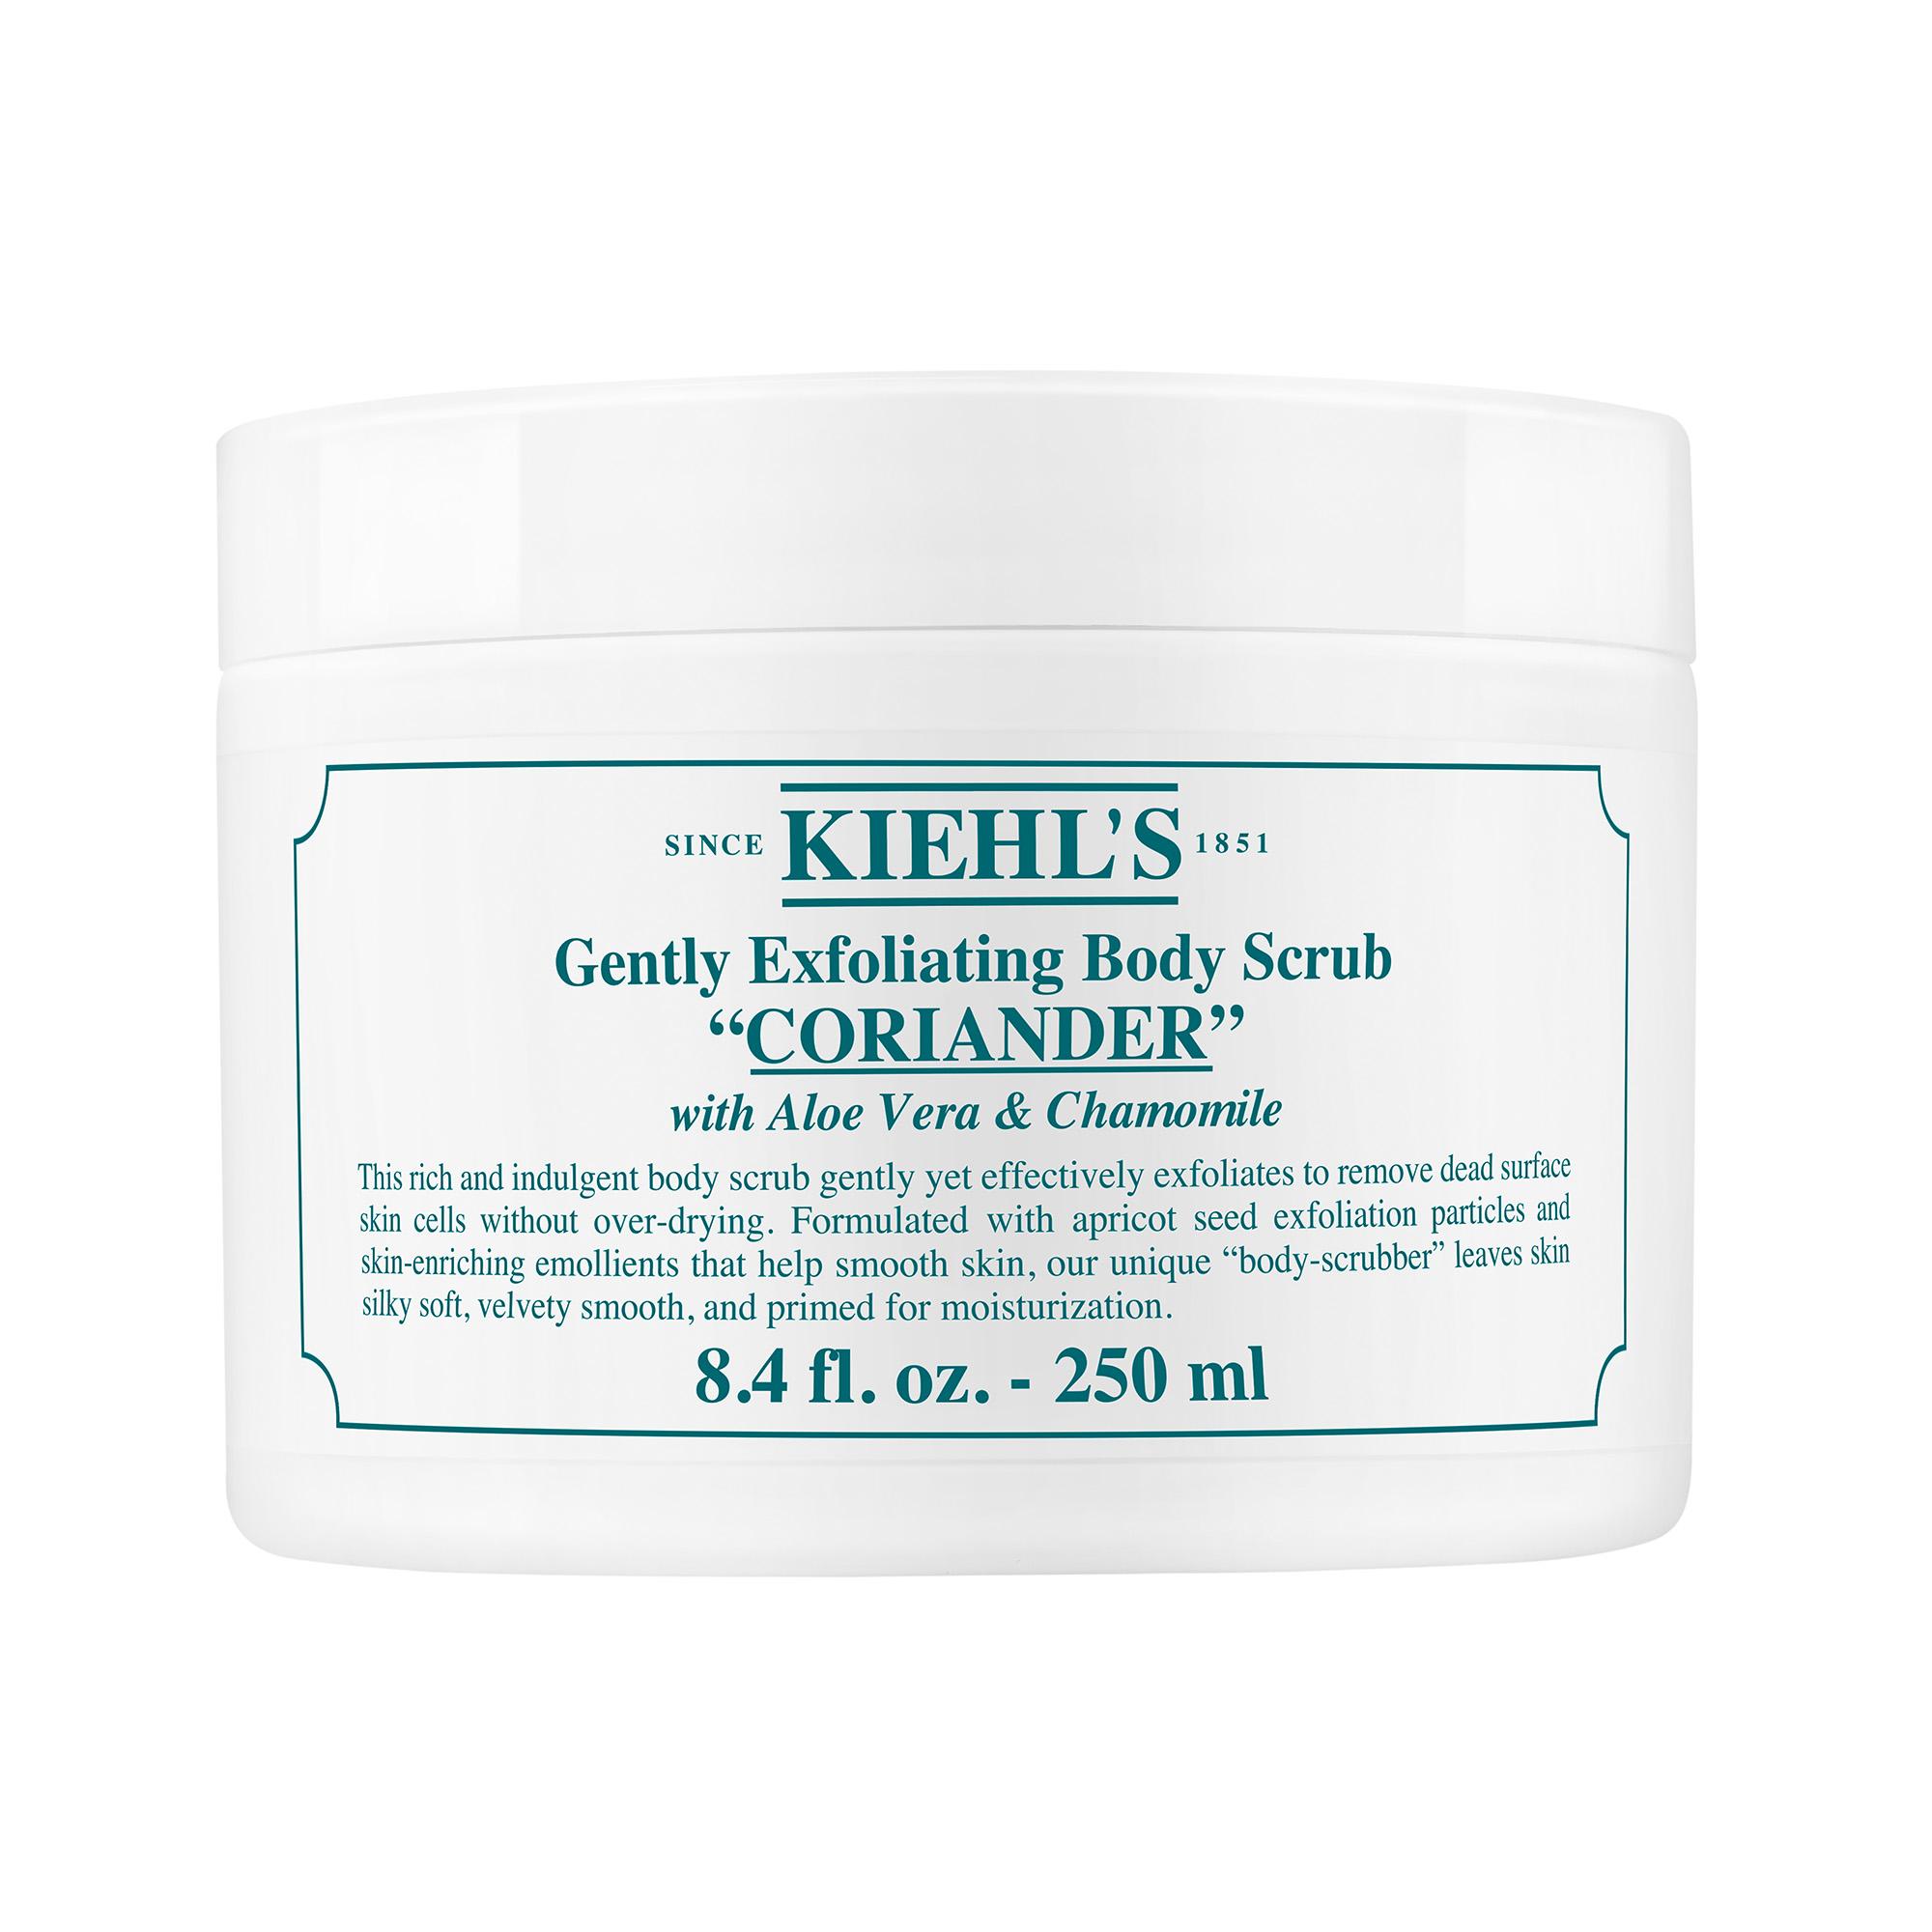 Gently Exfoliating Body Scrub - Coriander 250ml